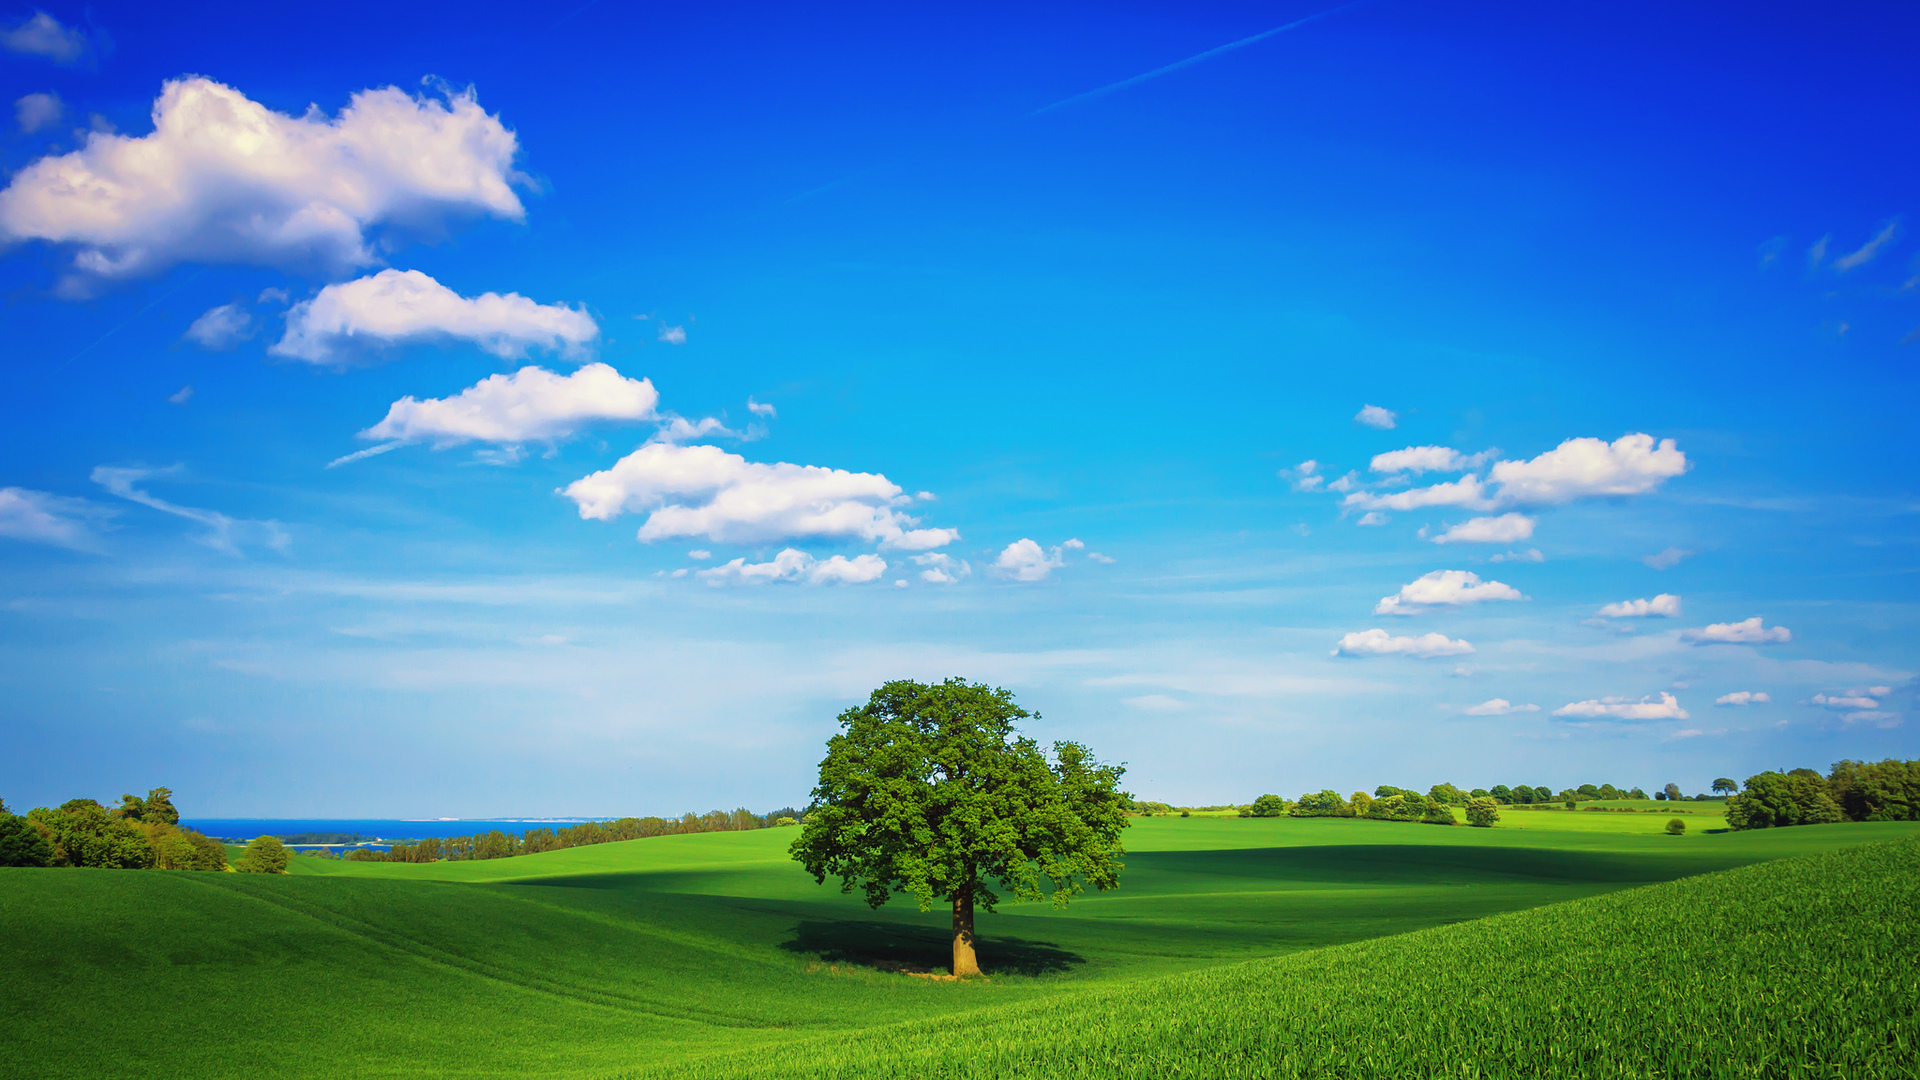 природа небо облака деревья поле nature the sky clouds trees field  № 243716 без смс